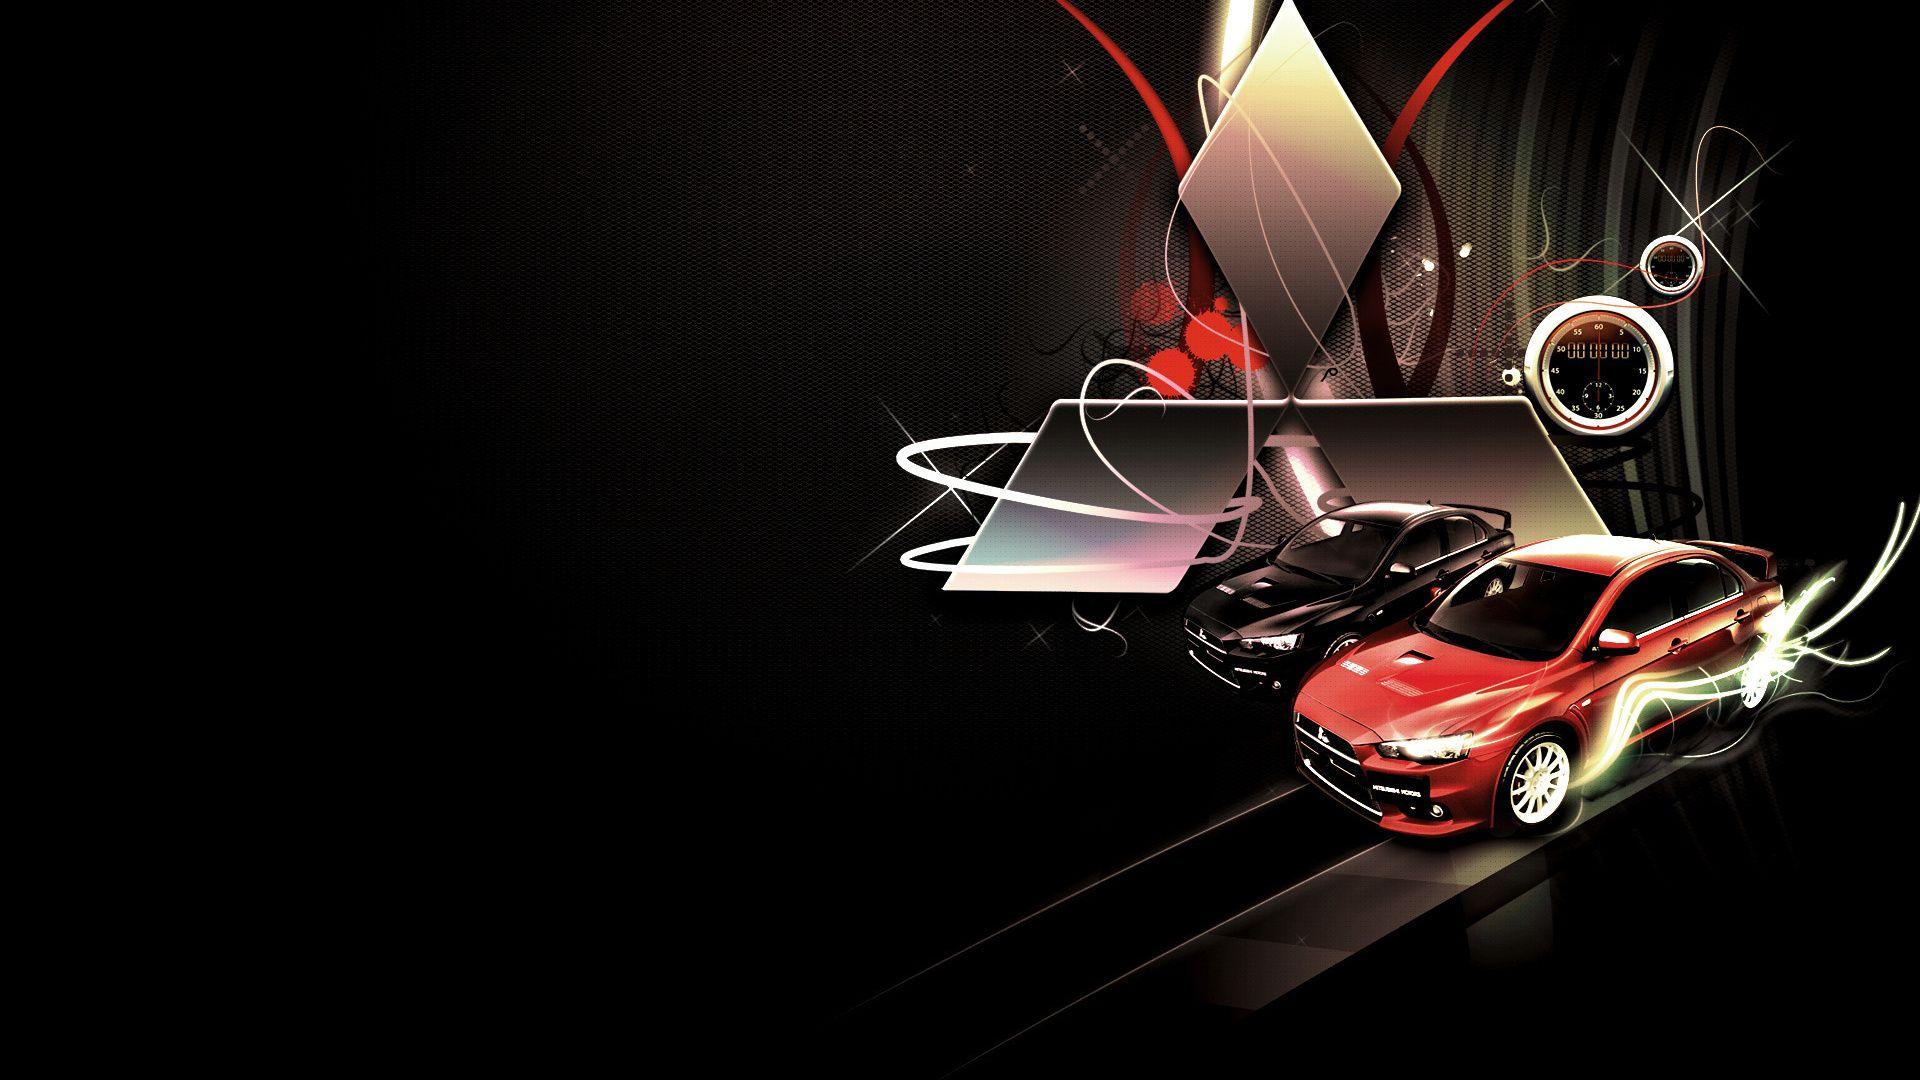 Iphone Wallpapers Mitsubishi, Car Logo Vertical